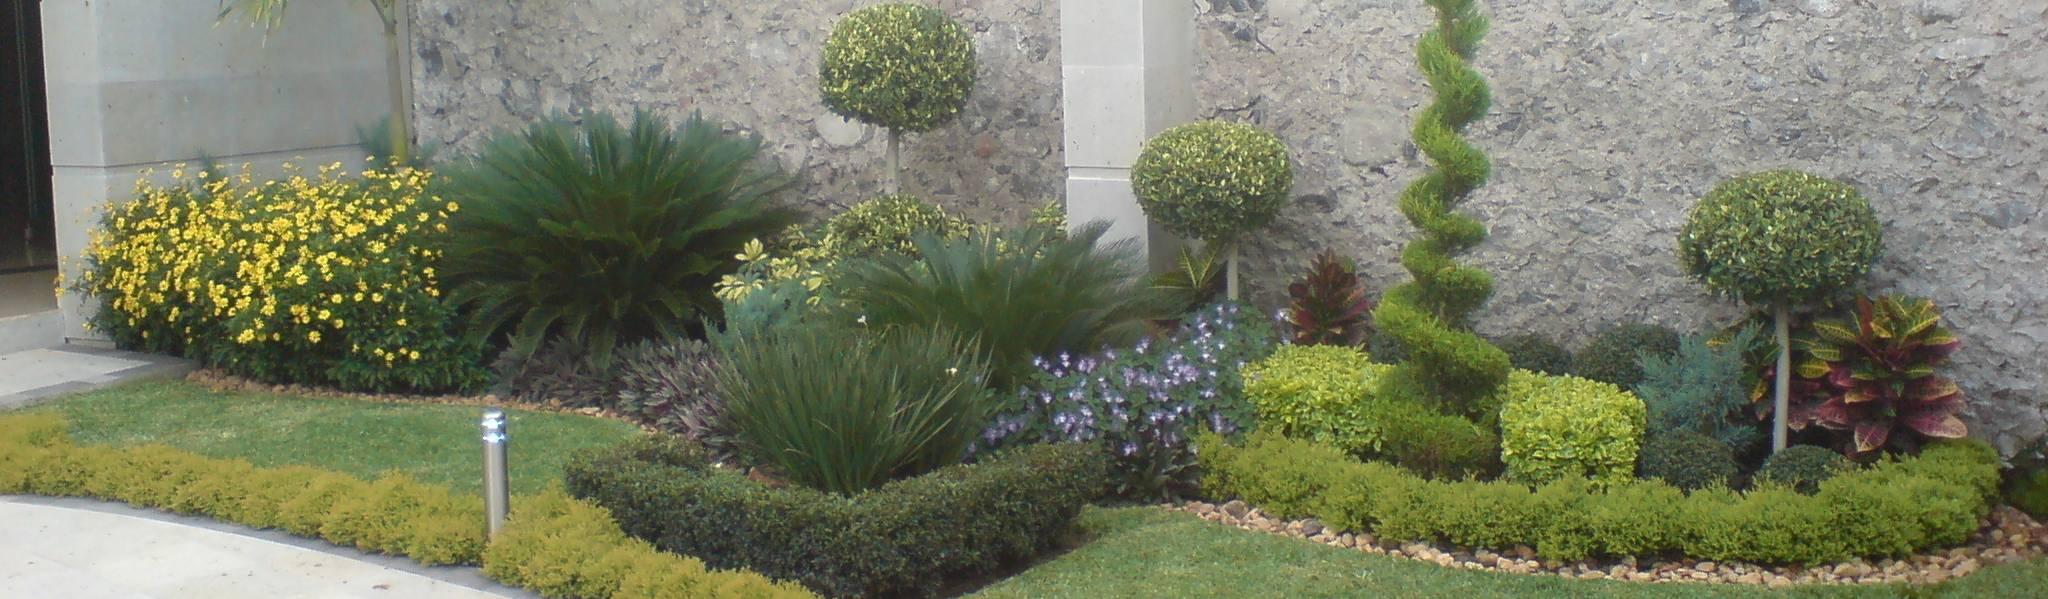 Jard n tropical de vivero sofia homify for Biombos para jardin